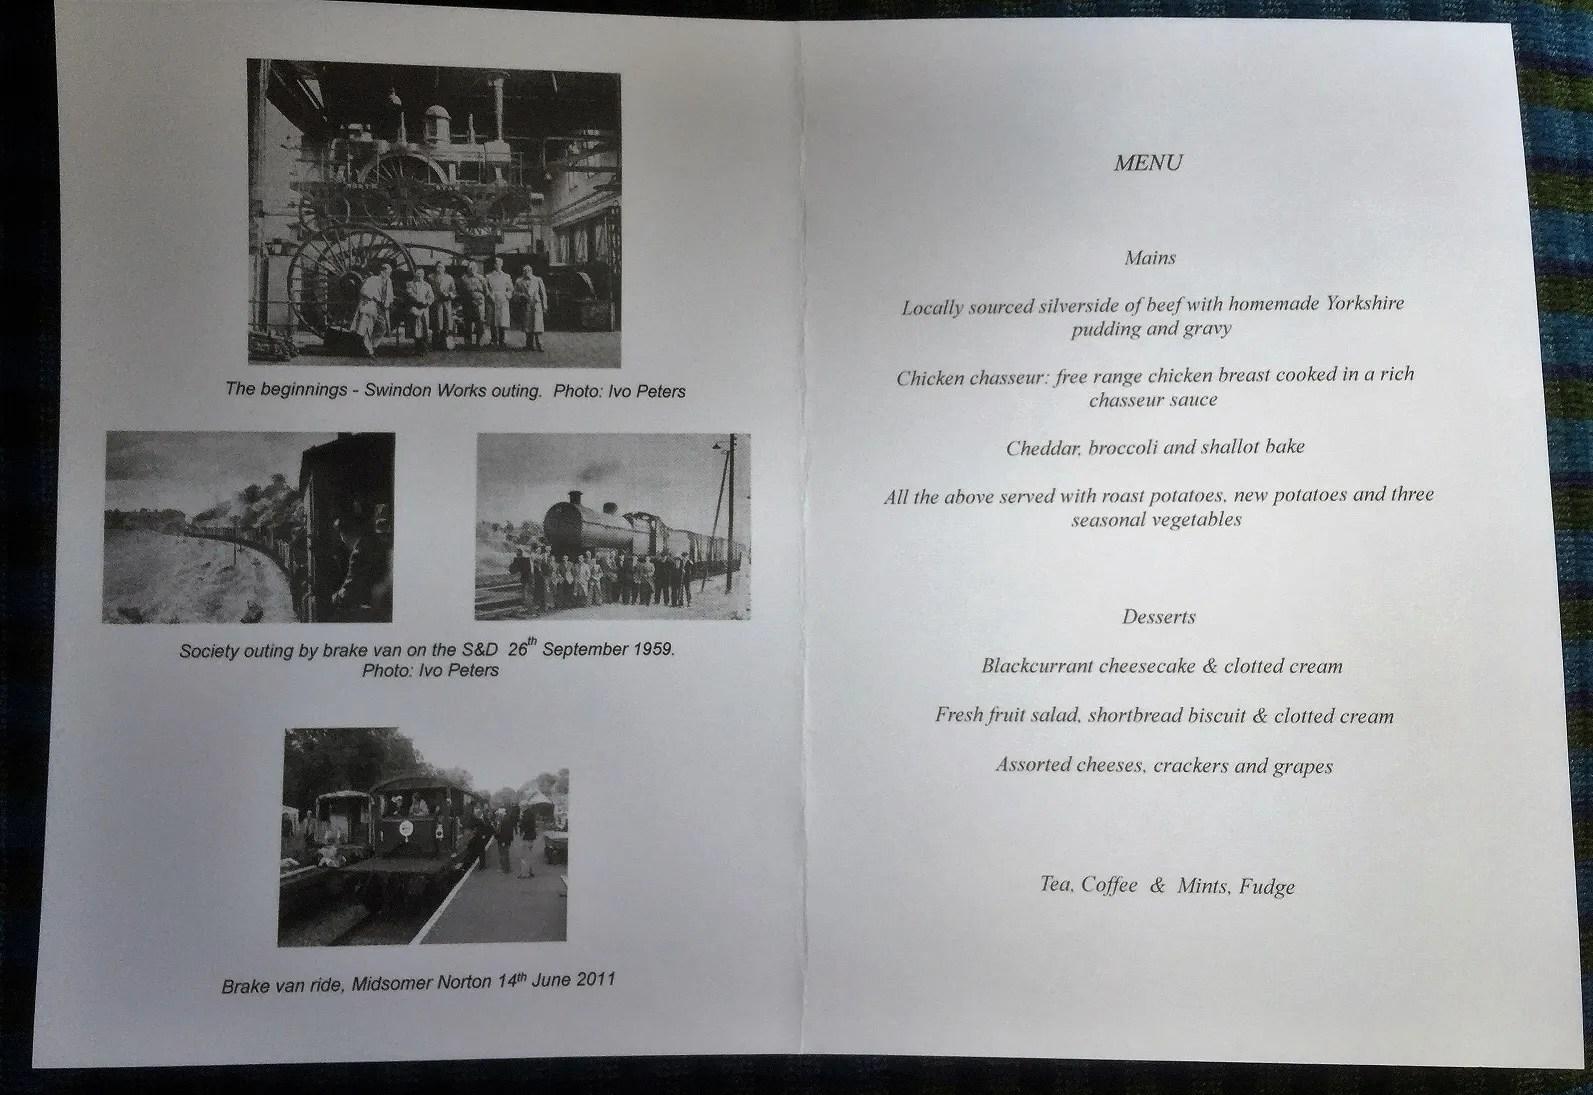 Bath Railway Society Jubilee Dinner menu